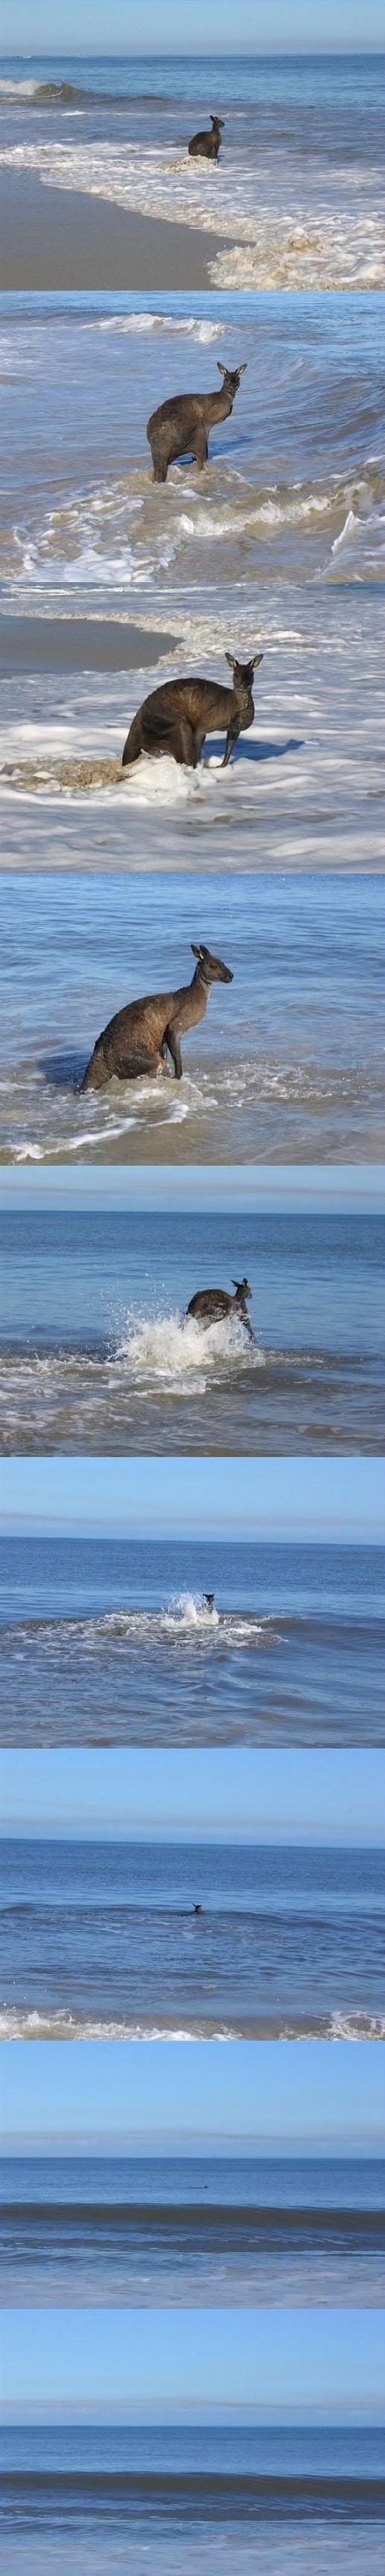 - kangaroo swimming